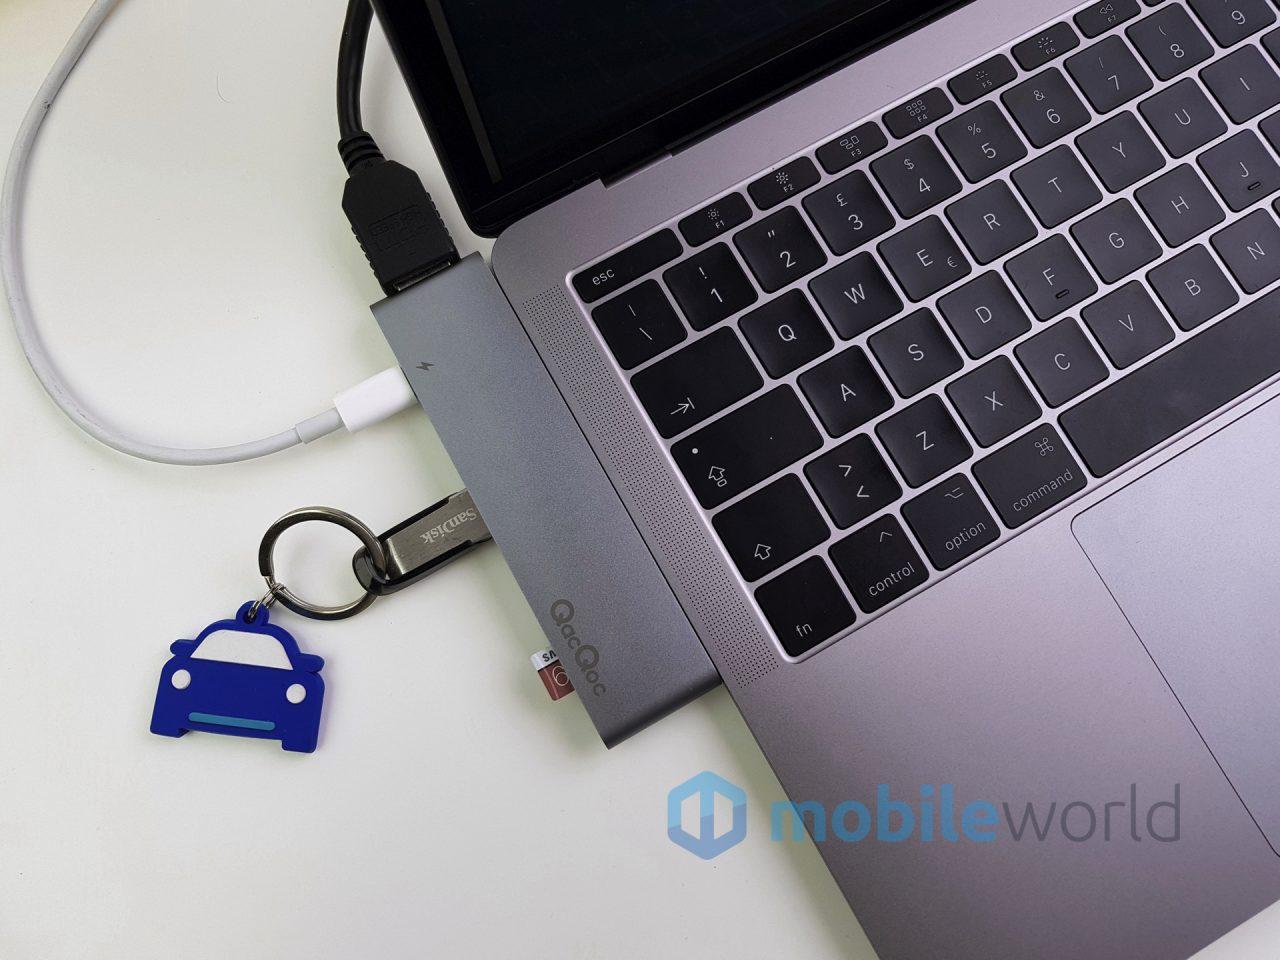 Dongle USB-C QacQoc GN28K, la nostra prova (foto)